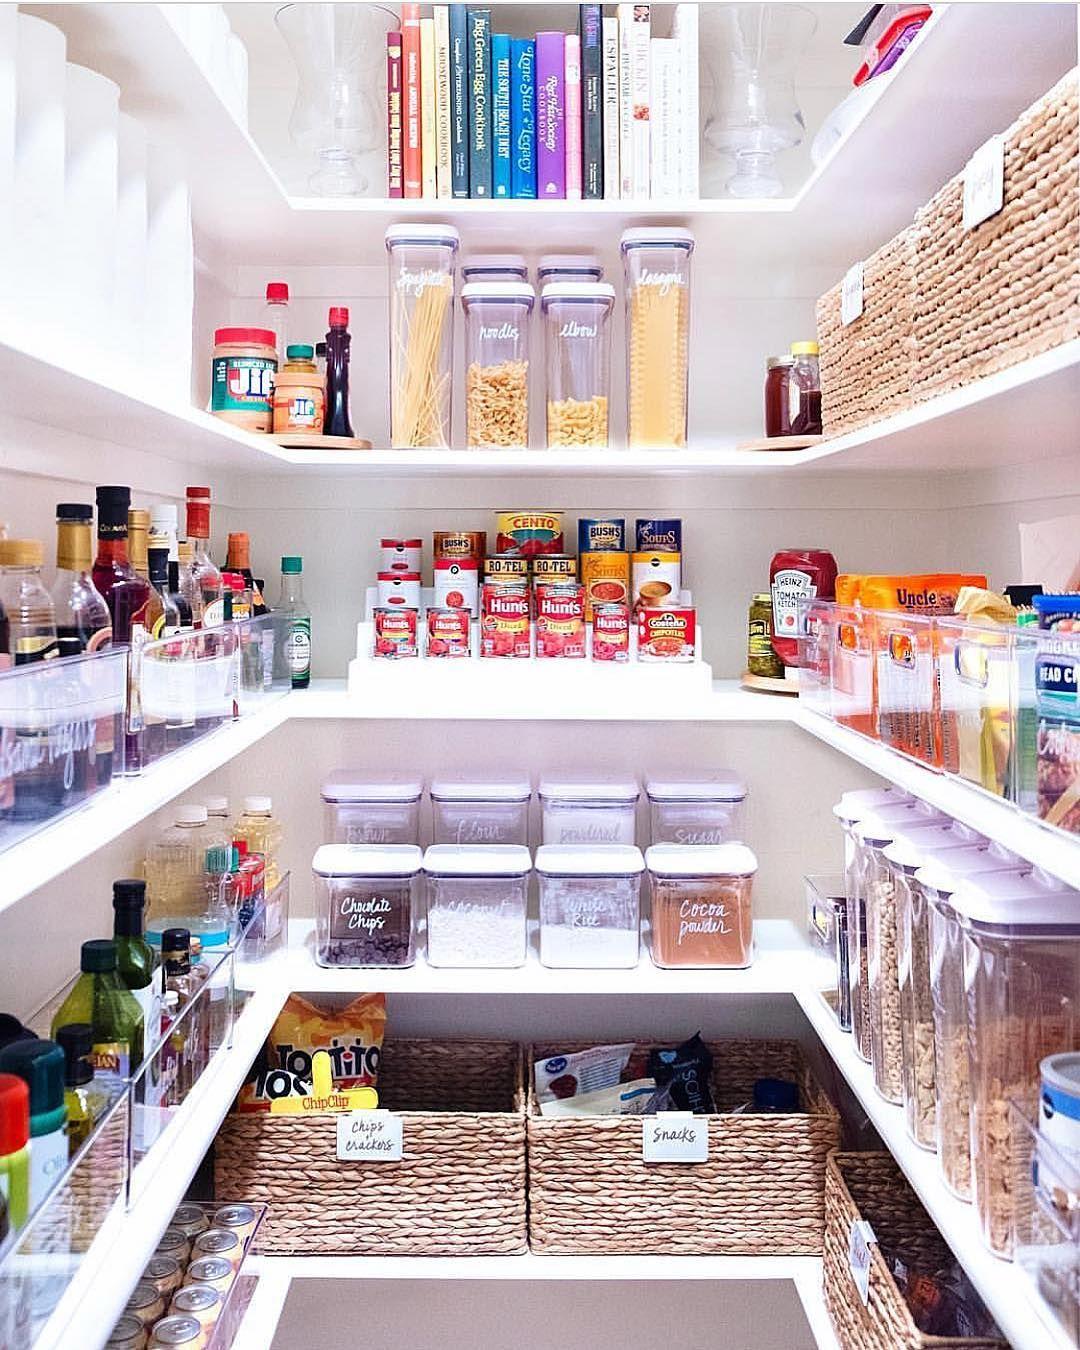 Pin by jezula stfelix on home in pinterest pantry